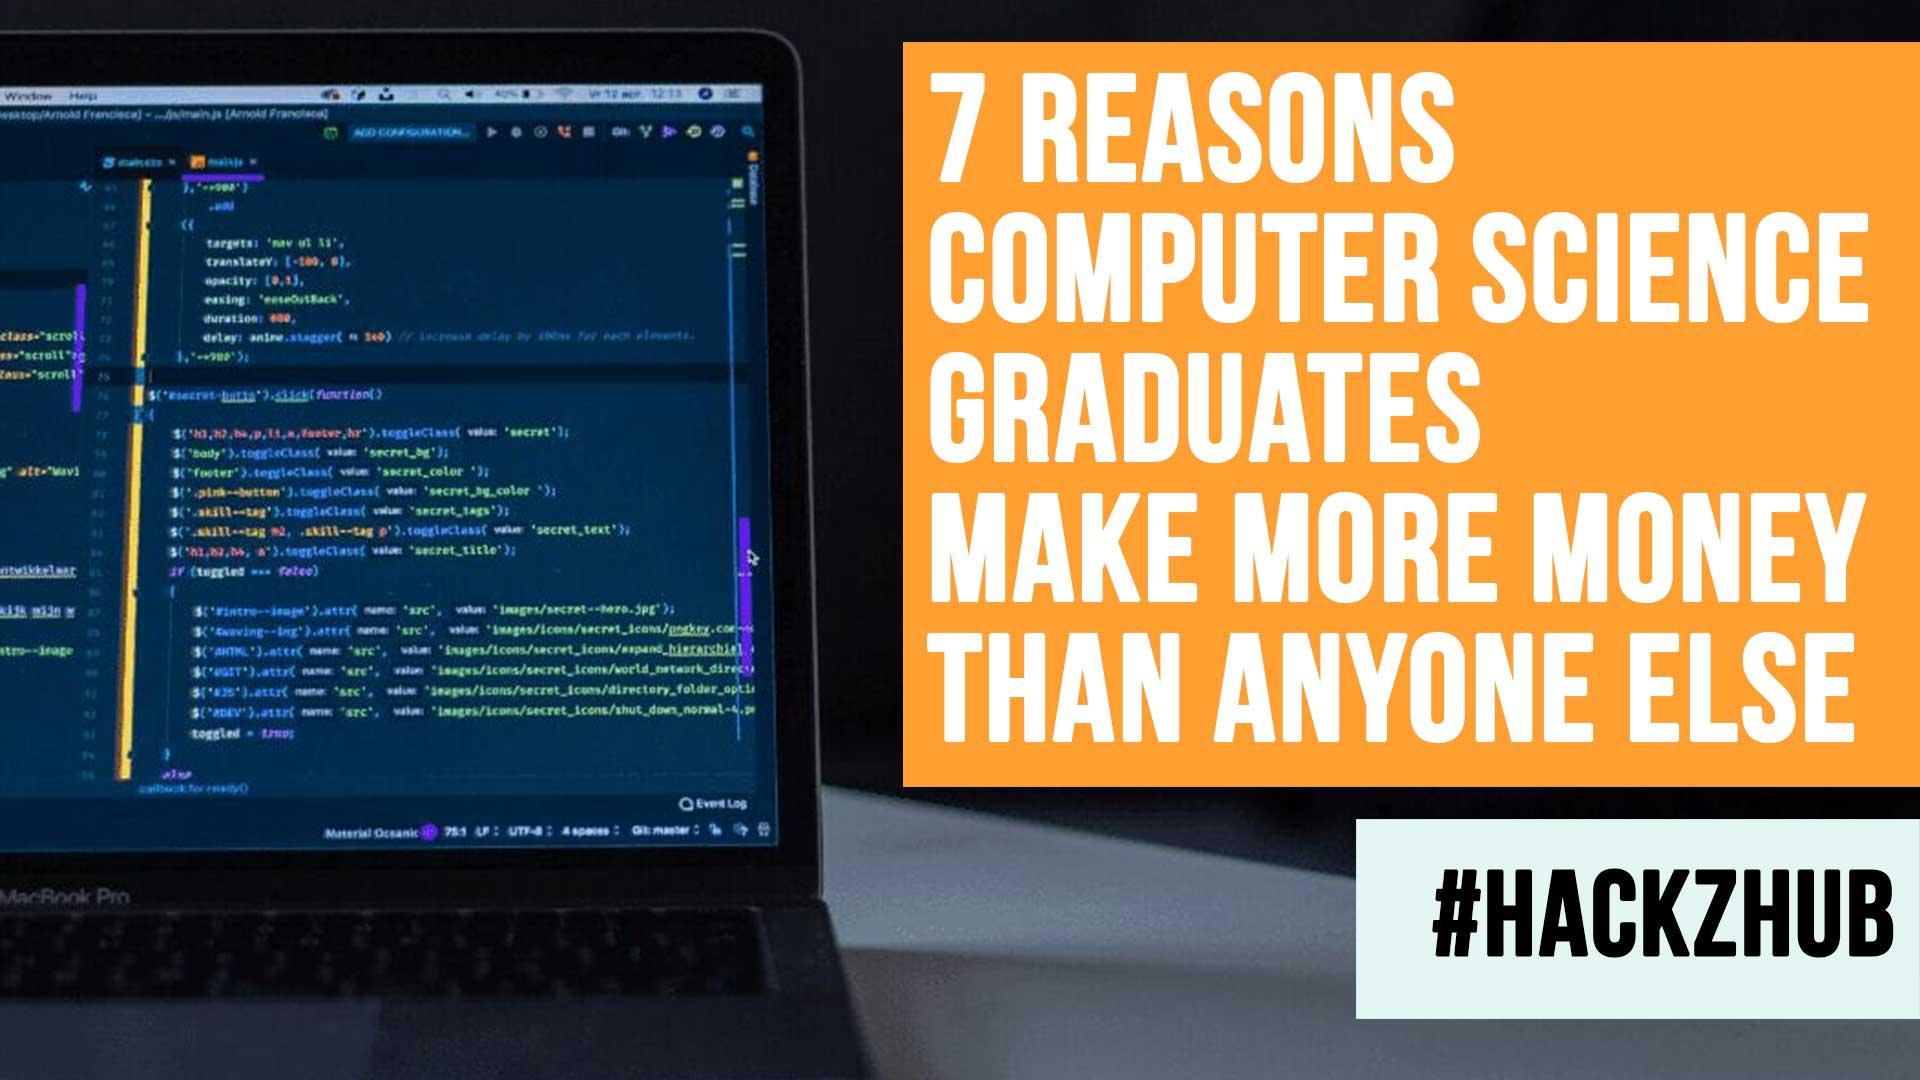 7 Reasons Computer Science Graduates Make More Money than Anyone Else